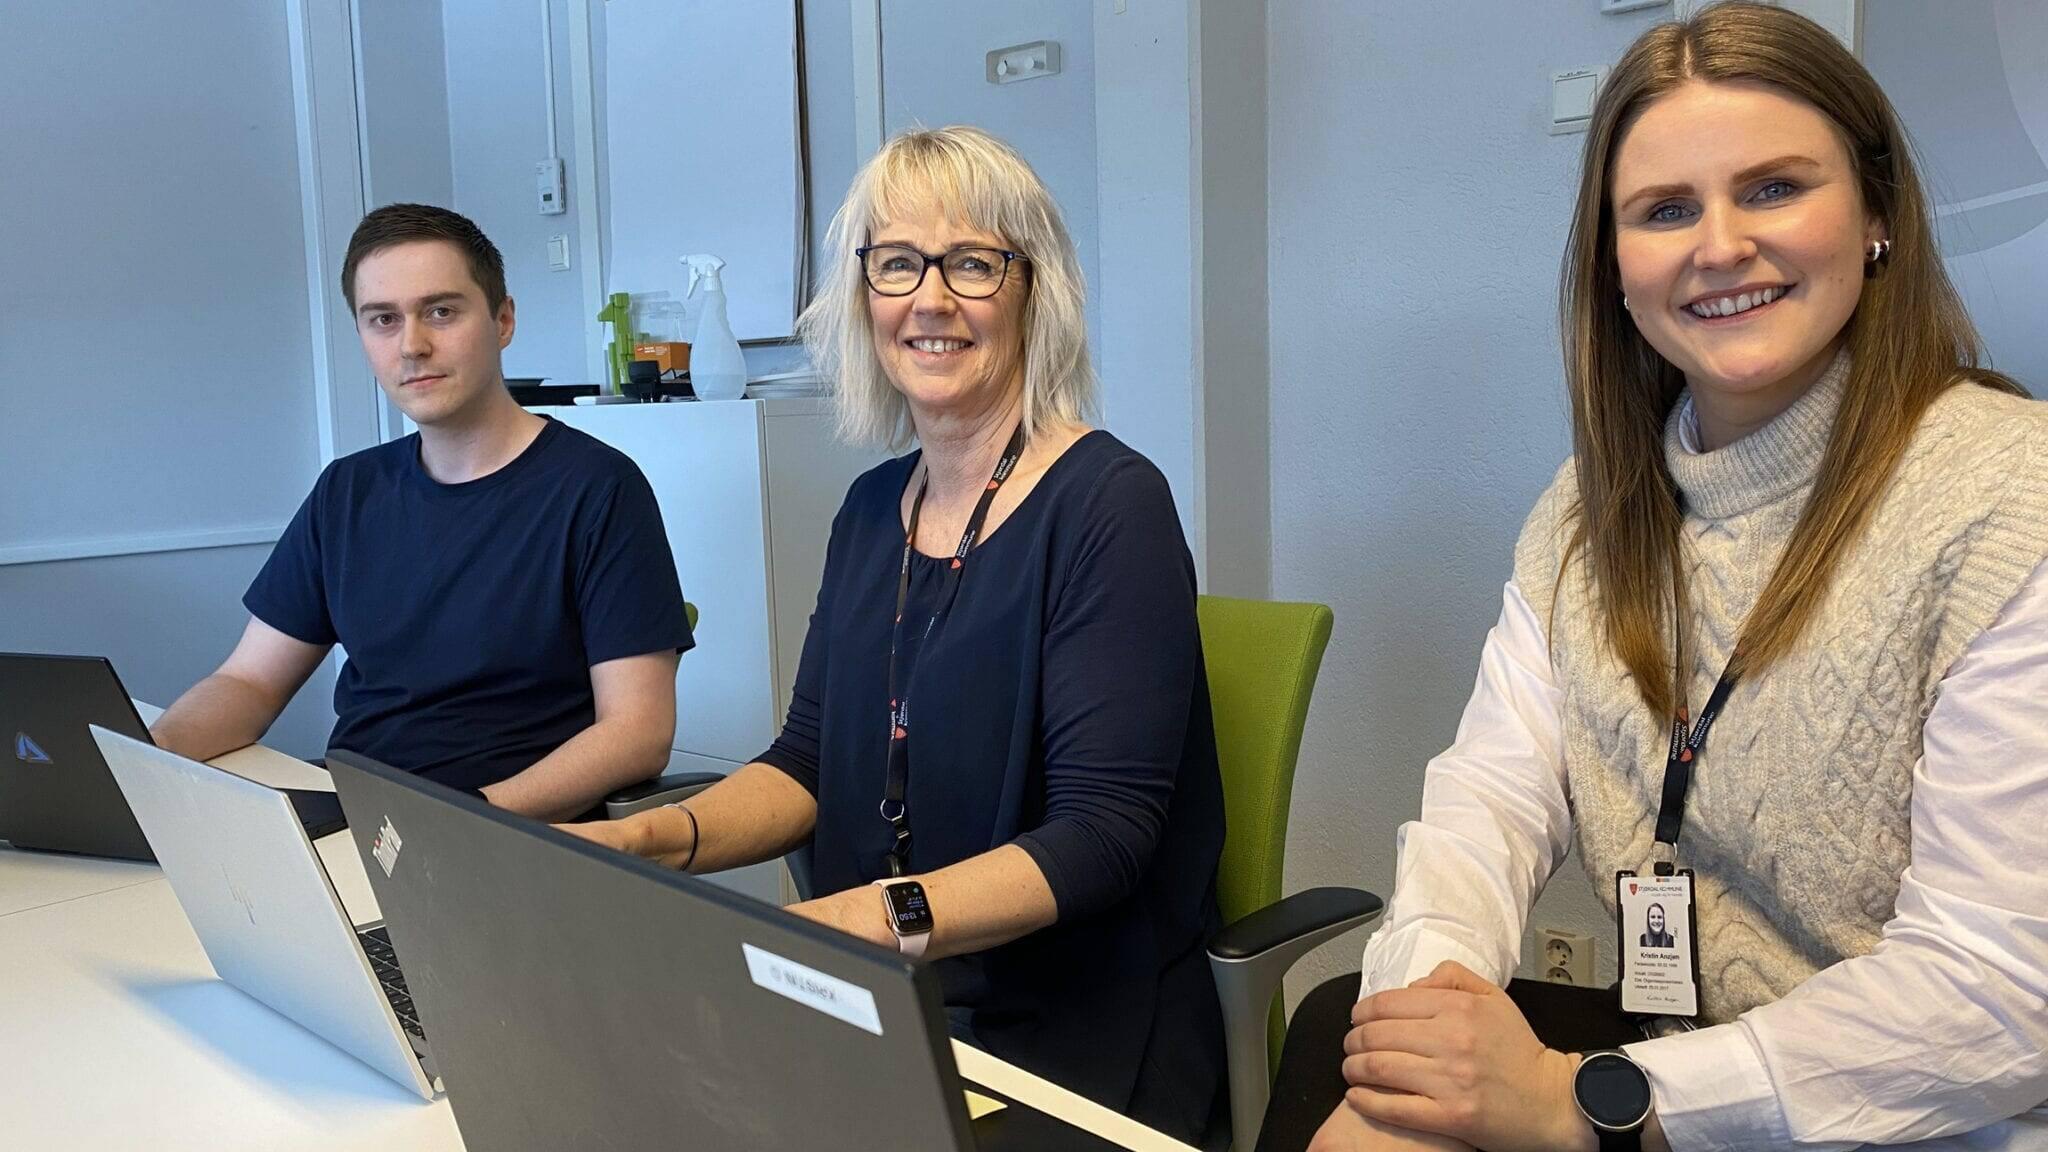 Digitalt team: Bjørnar Stamnes Aftret, Elin Wikmark Darell og Kristin Anzjøn i Værnesregionen IT er svært fornøyd med samarbeidet med Ren Røros. Foto: Ren Røros